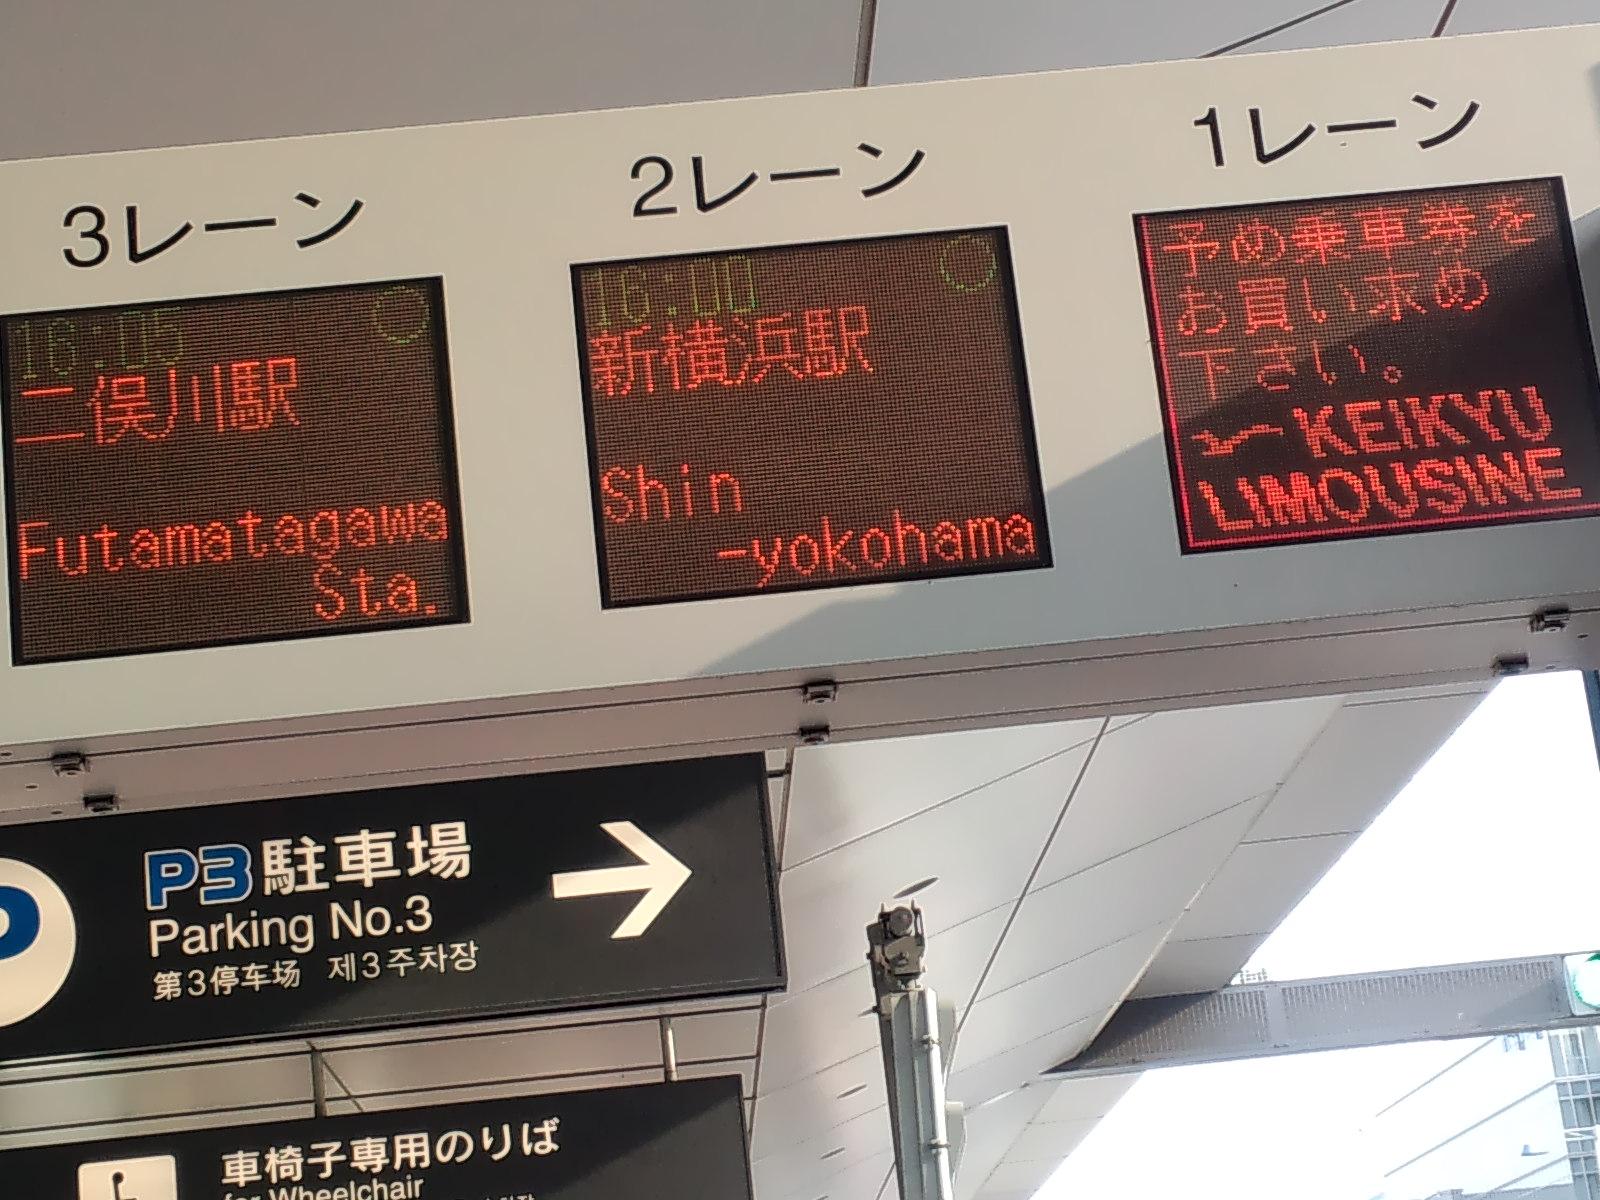 Via Shin-Yokohama